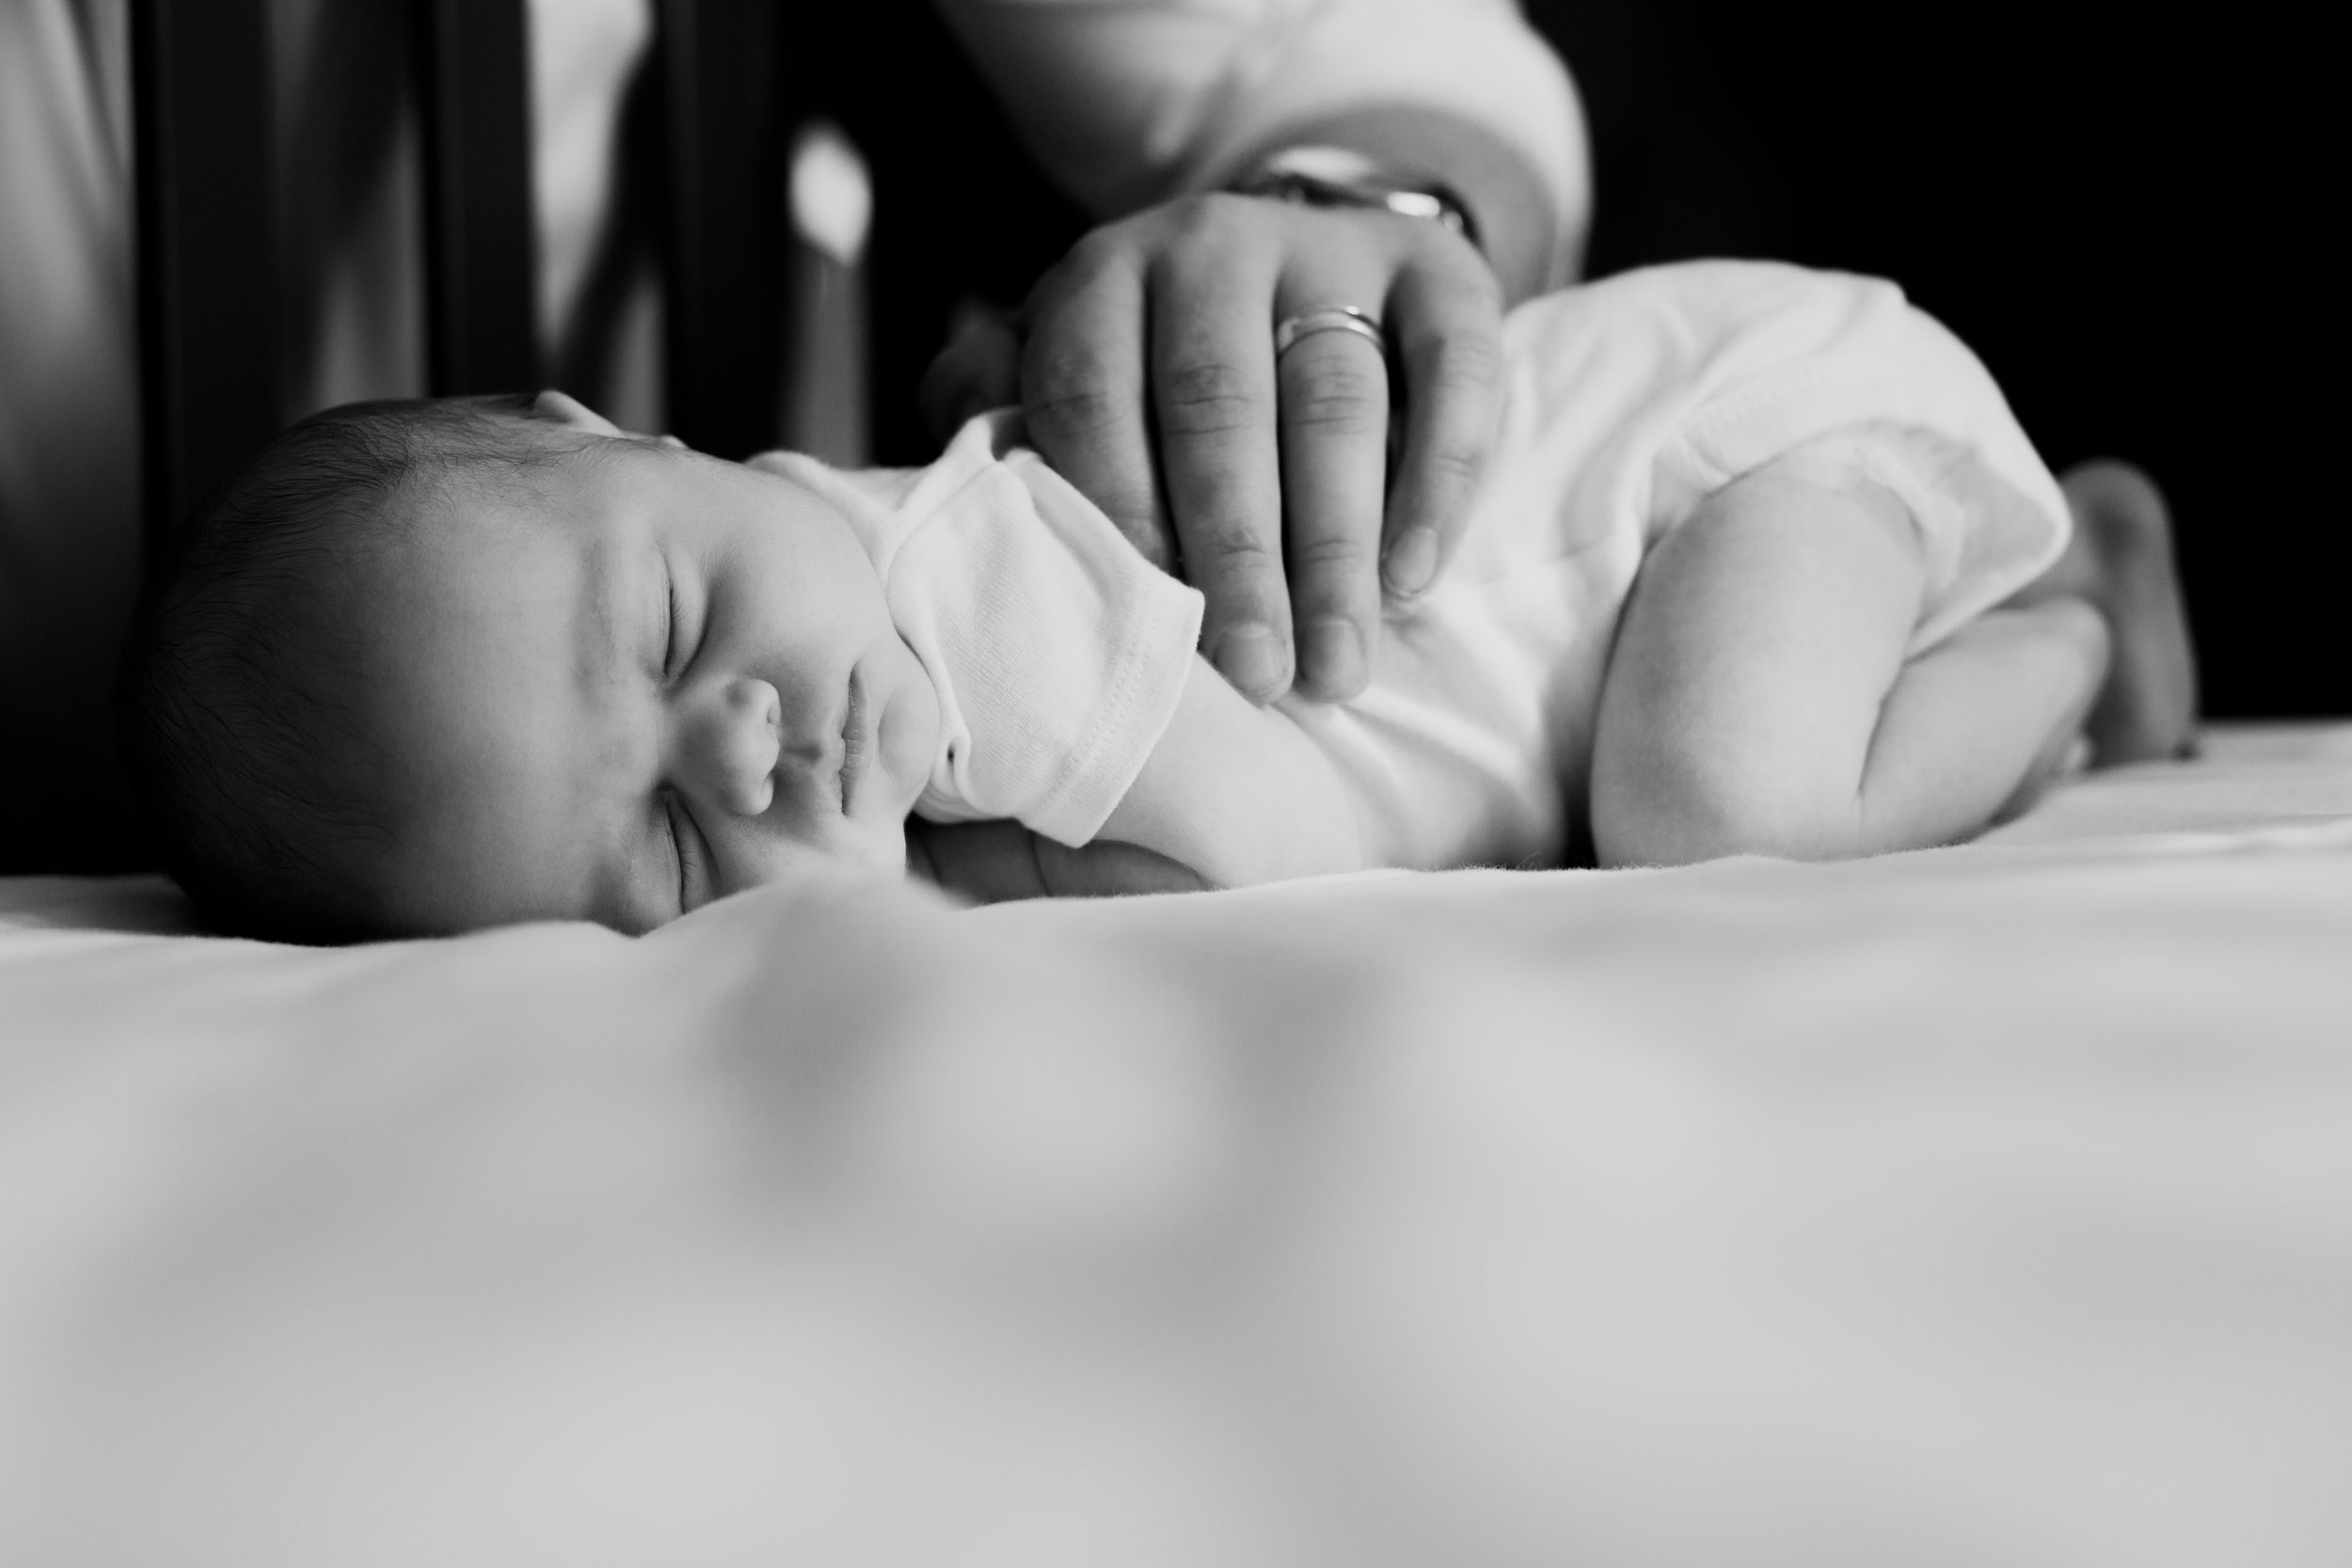 180809_Colton-Mounce-Newborn_56.jpg